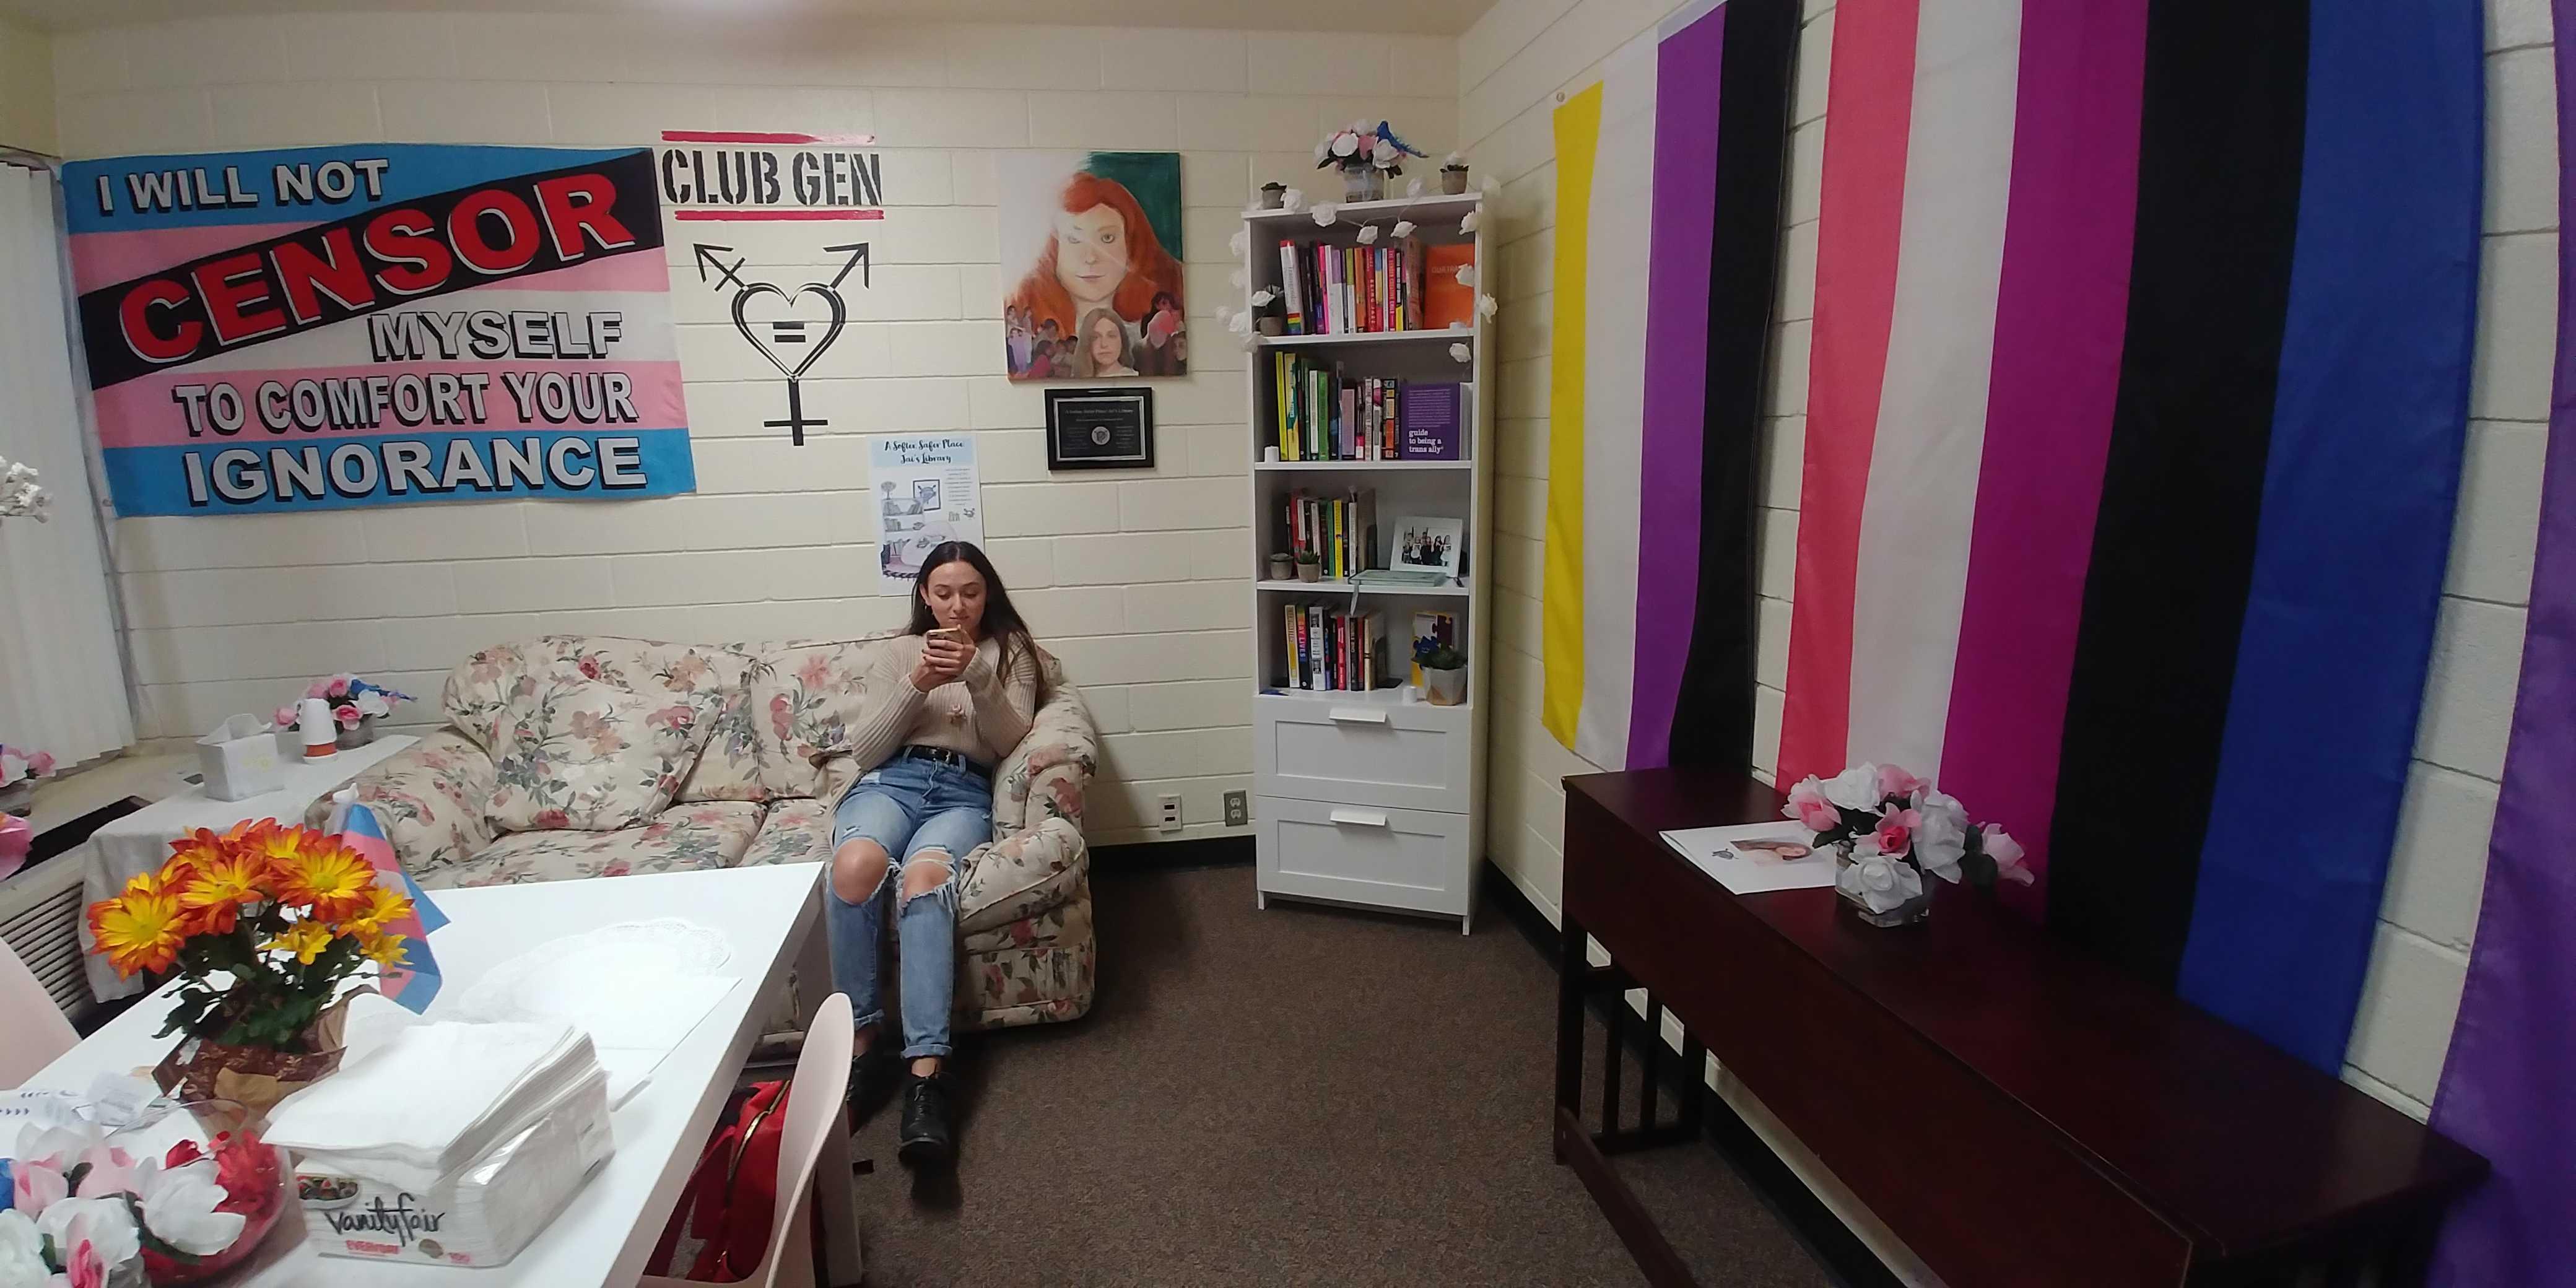 Club Gen battles transphobia